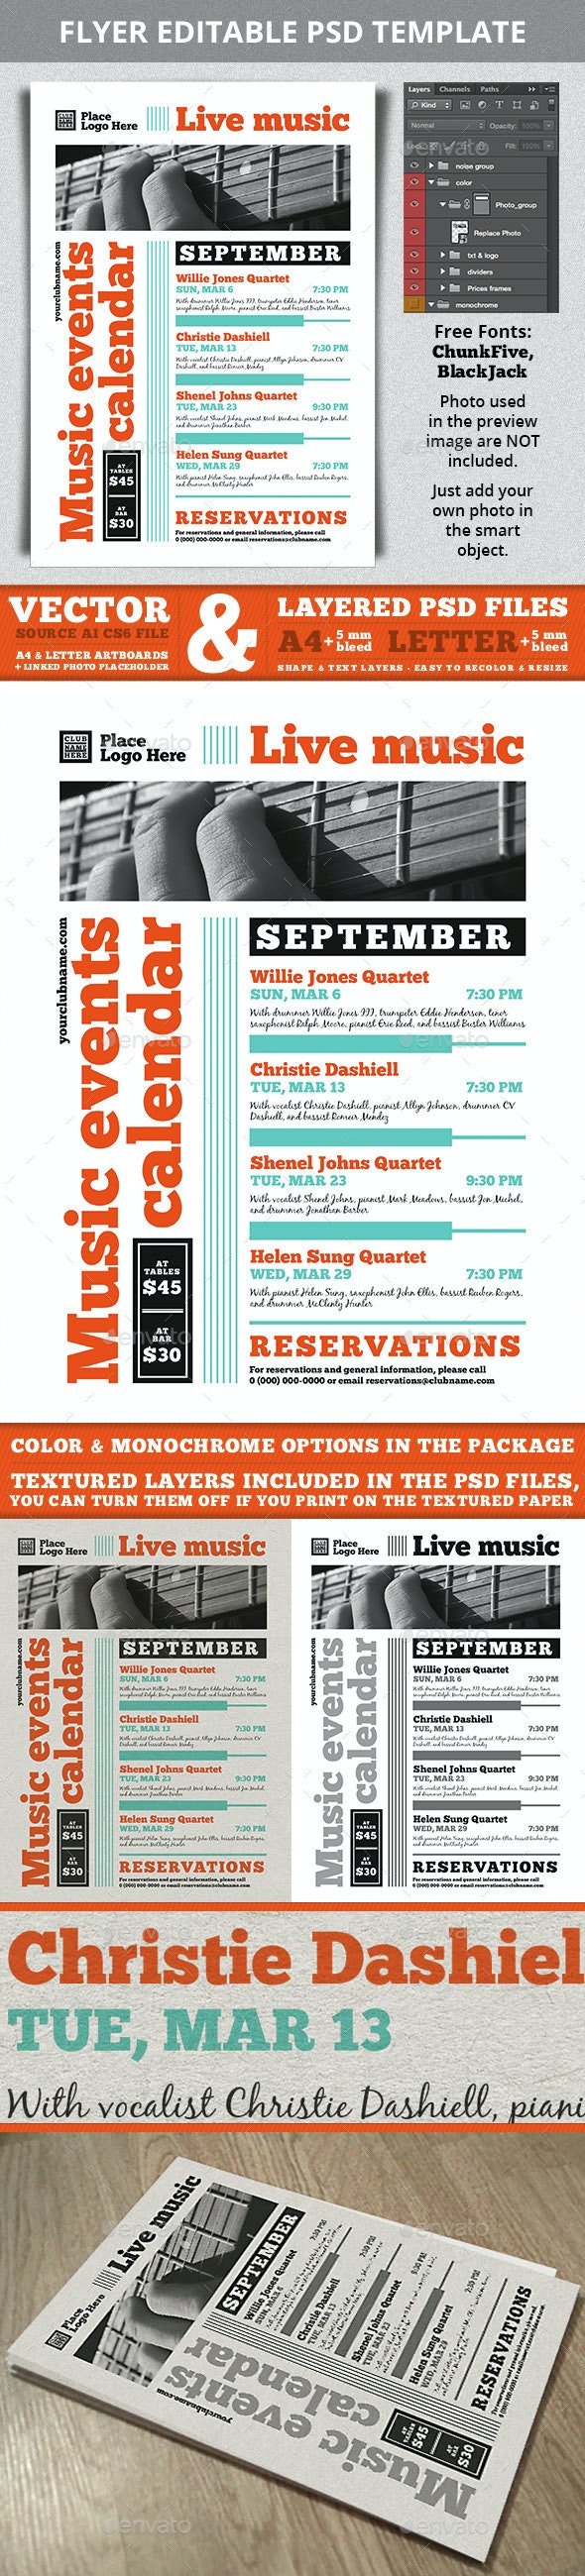 Music Events Calendar A4 Flyer Template - Events Flyers